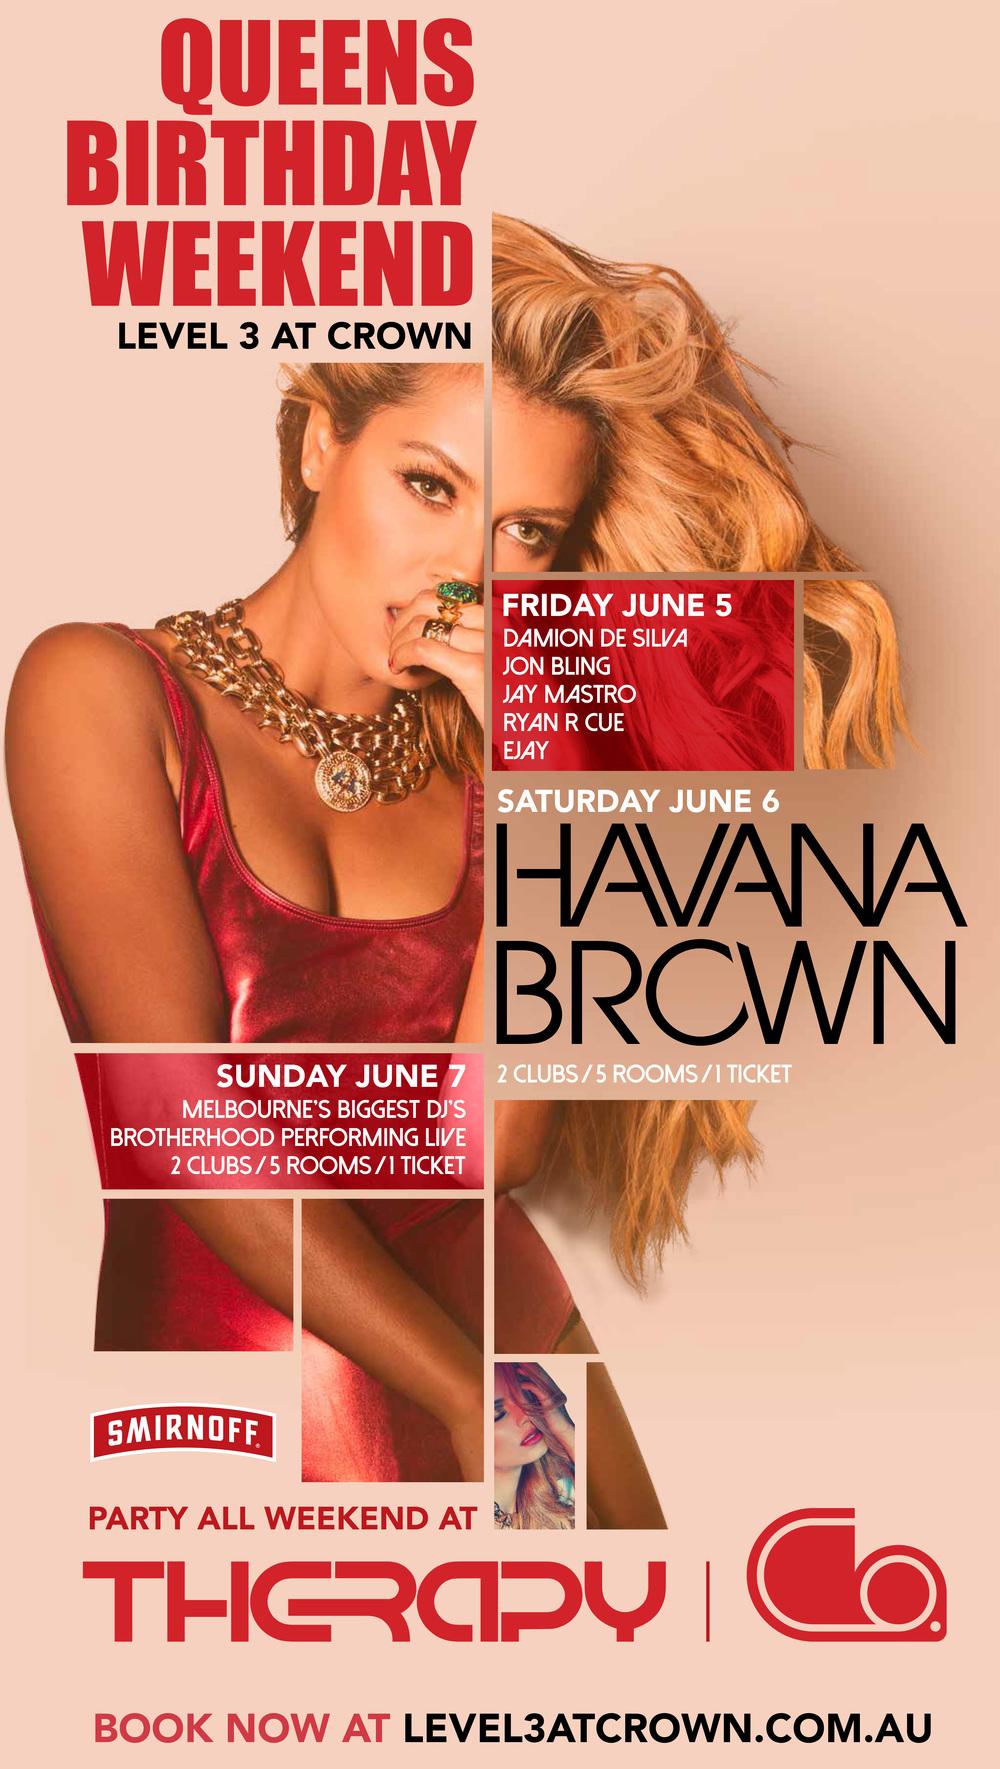 C CUS14_00036 Havana Queens Birthday Crown Retail Duratran 905x1805.jpg